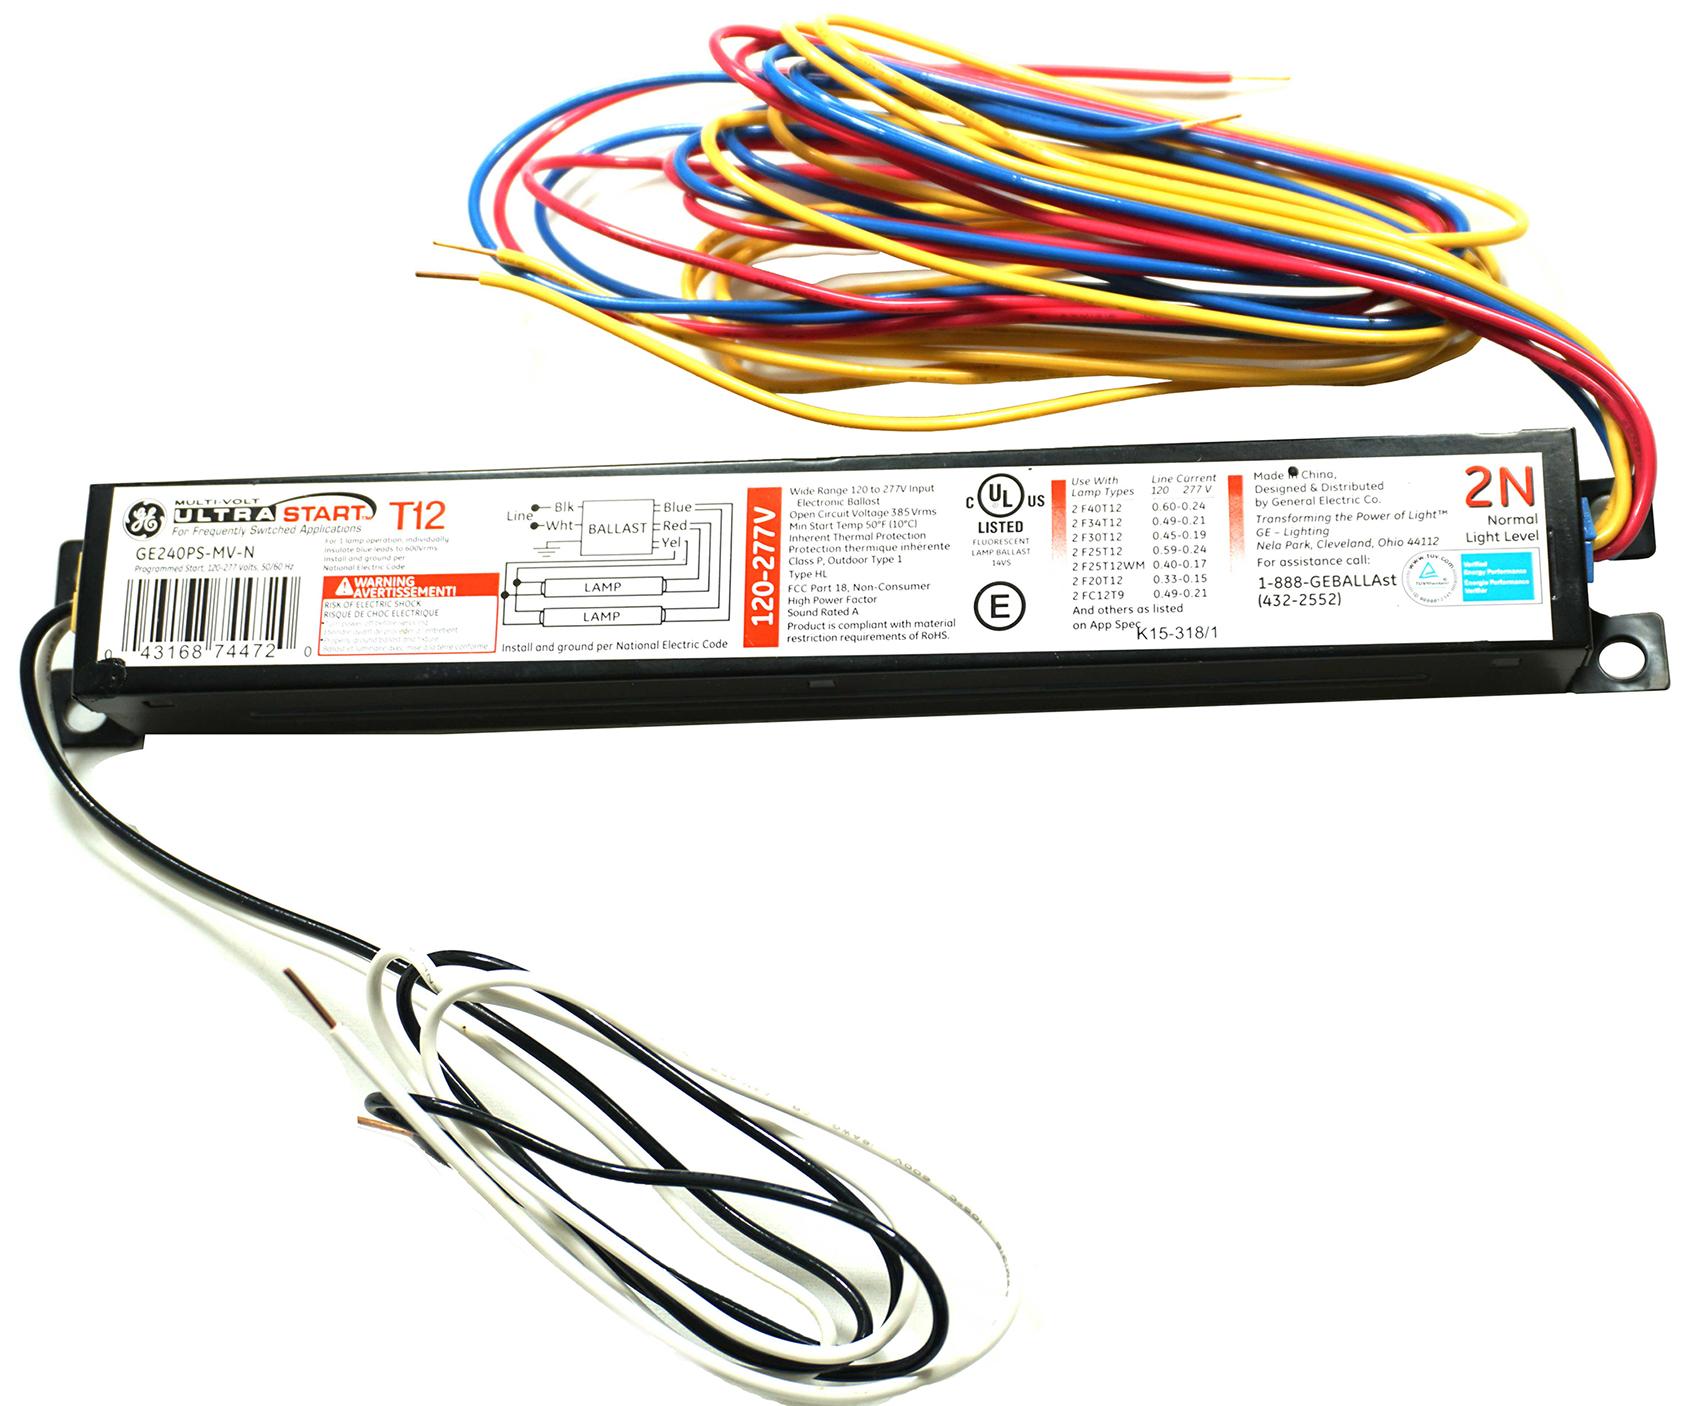 Ge F40t12 Ballast Wiring Diagram - Automotive Wiring Diagrams -  source-auto3.tukune.jeanjaures37.fr   Ge F40t12 Ballast Wiring Diagram      Wiring Diagram Resource